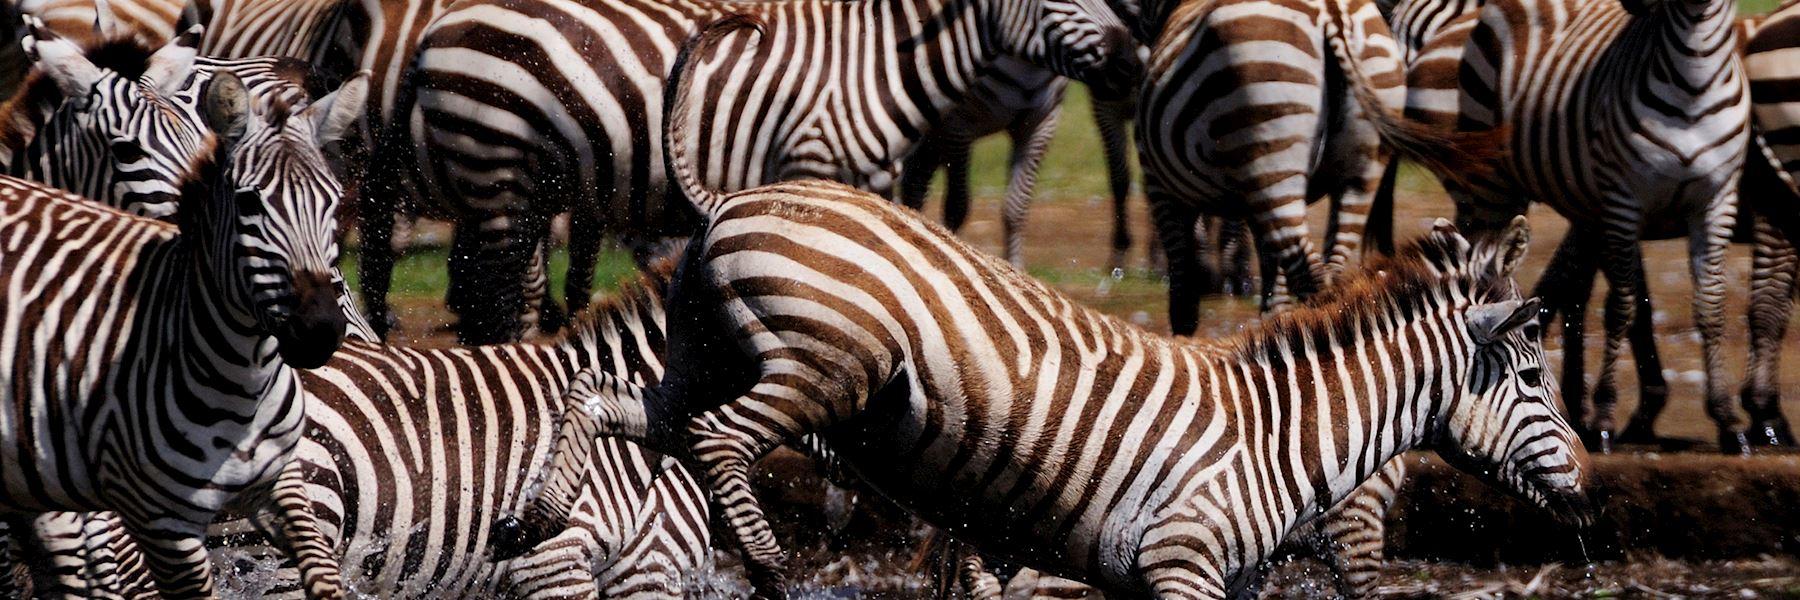 Kenya safaris & holidays